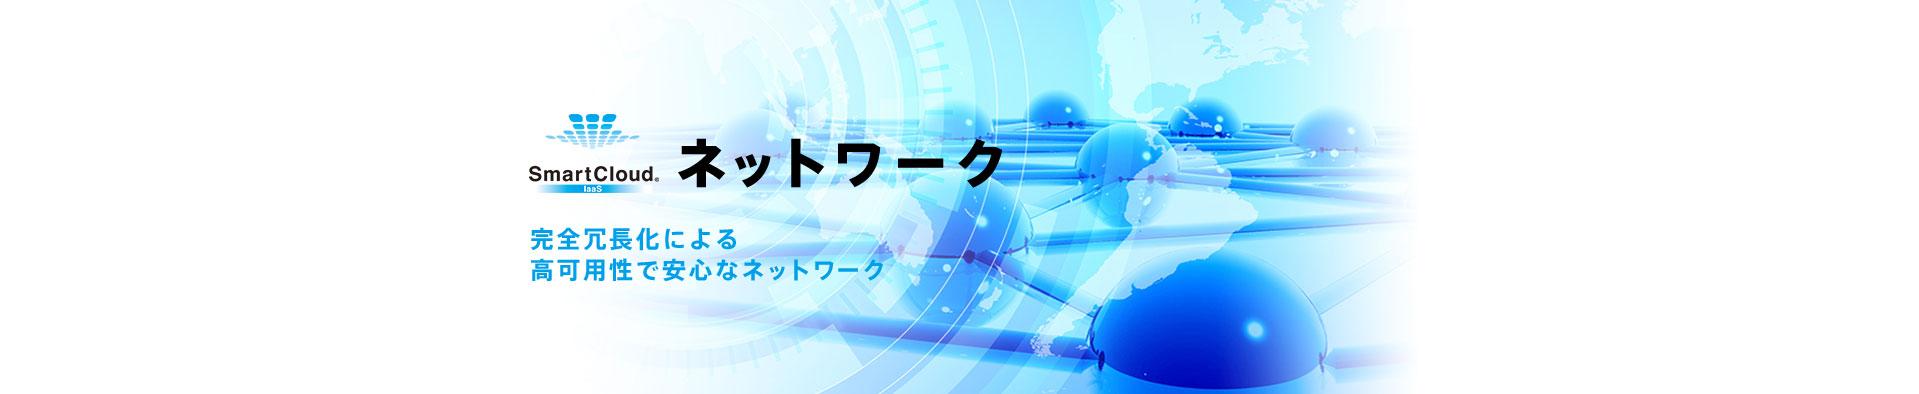 SmartCloud ネットワーク イメージ